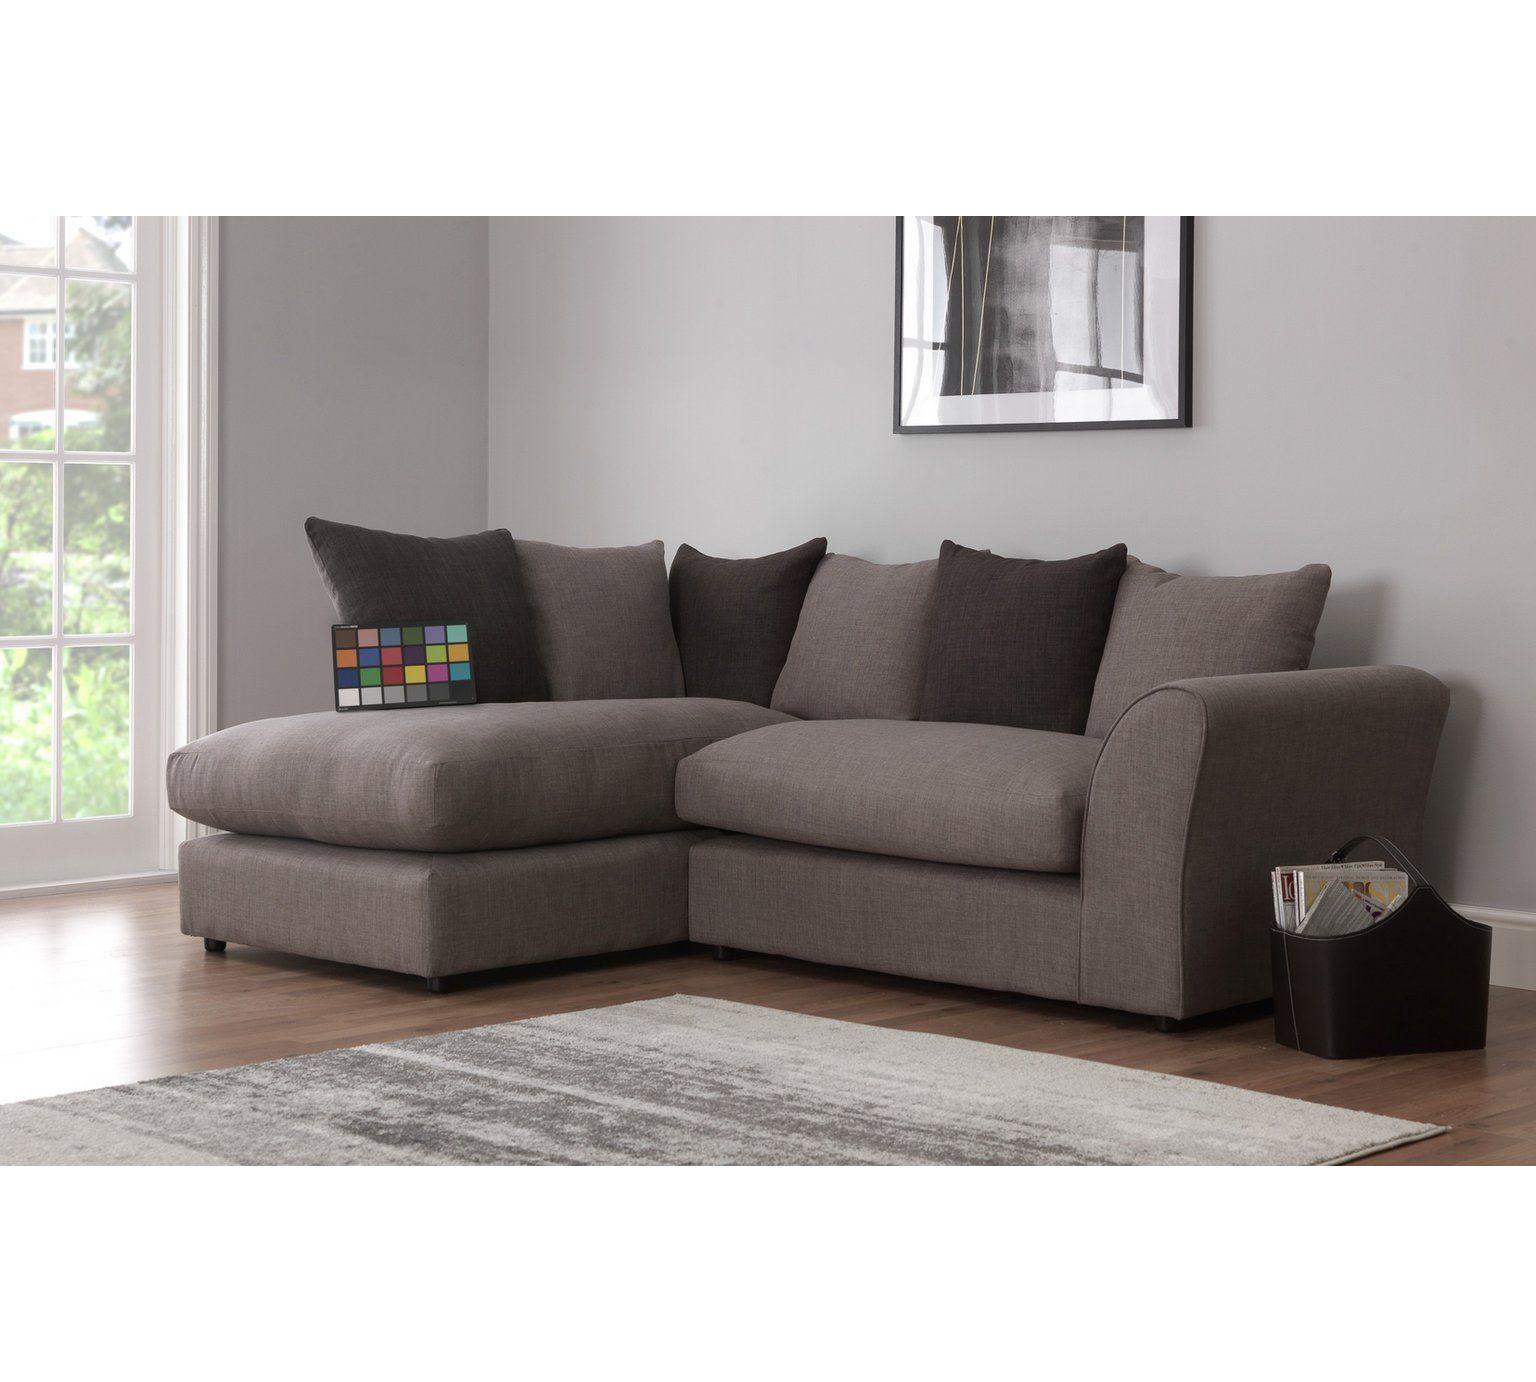 Buy HOME Maisie Regular Left Hand Corner Sofa   Grey At Argos.co.uk